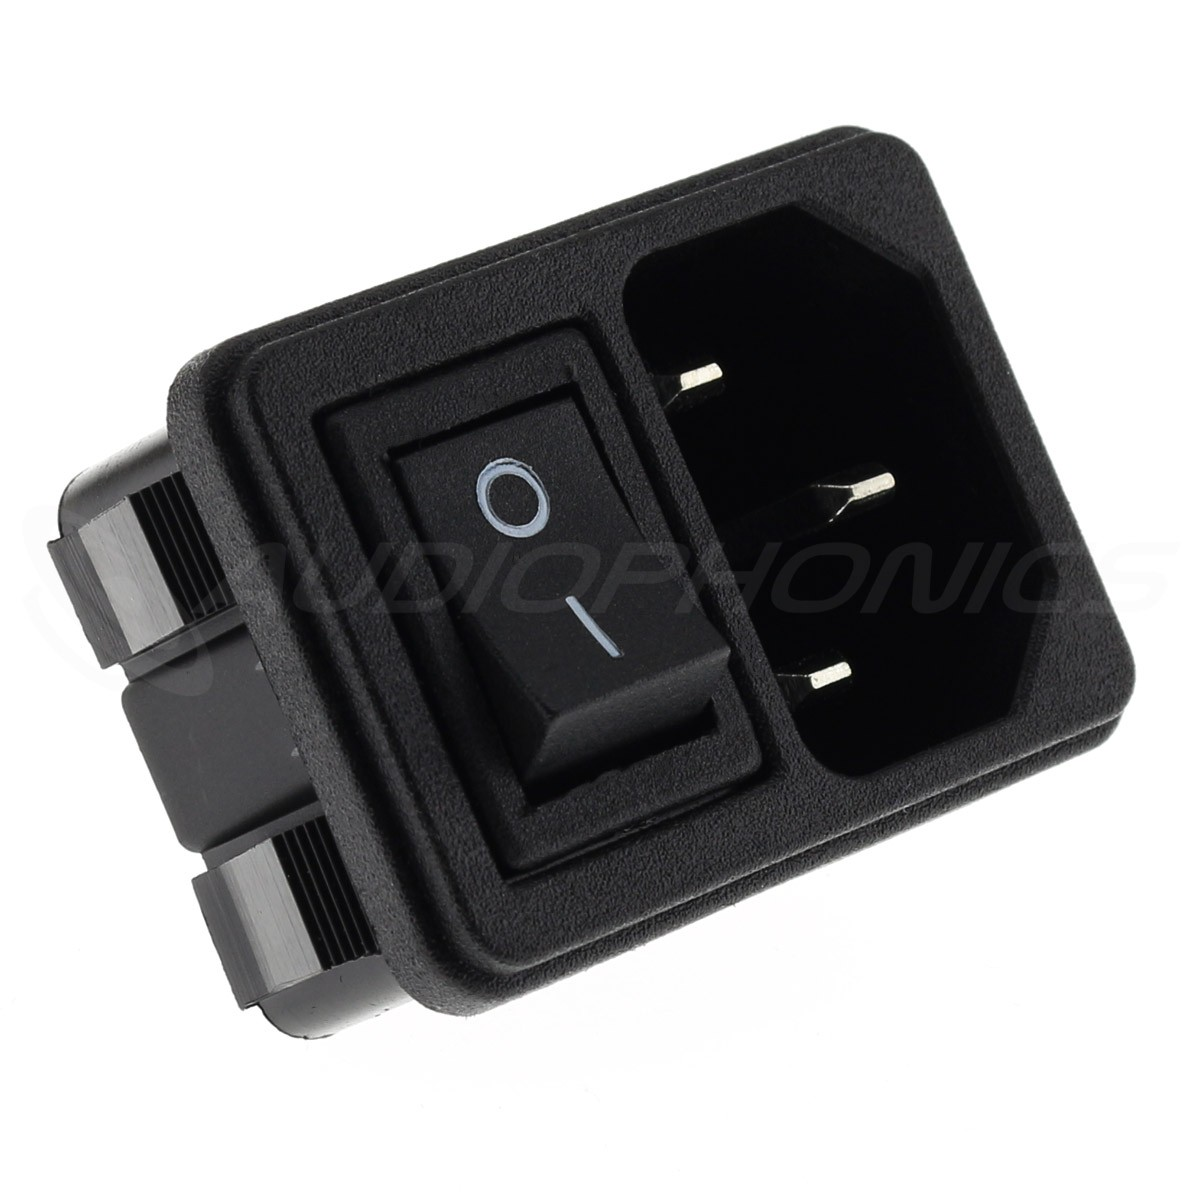 IEC C14 Plug with ON-OFF Switch 250V 10A Black